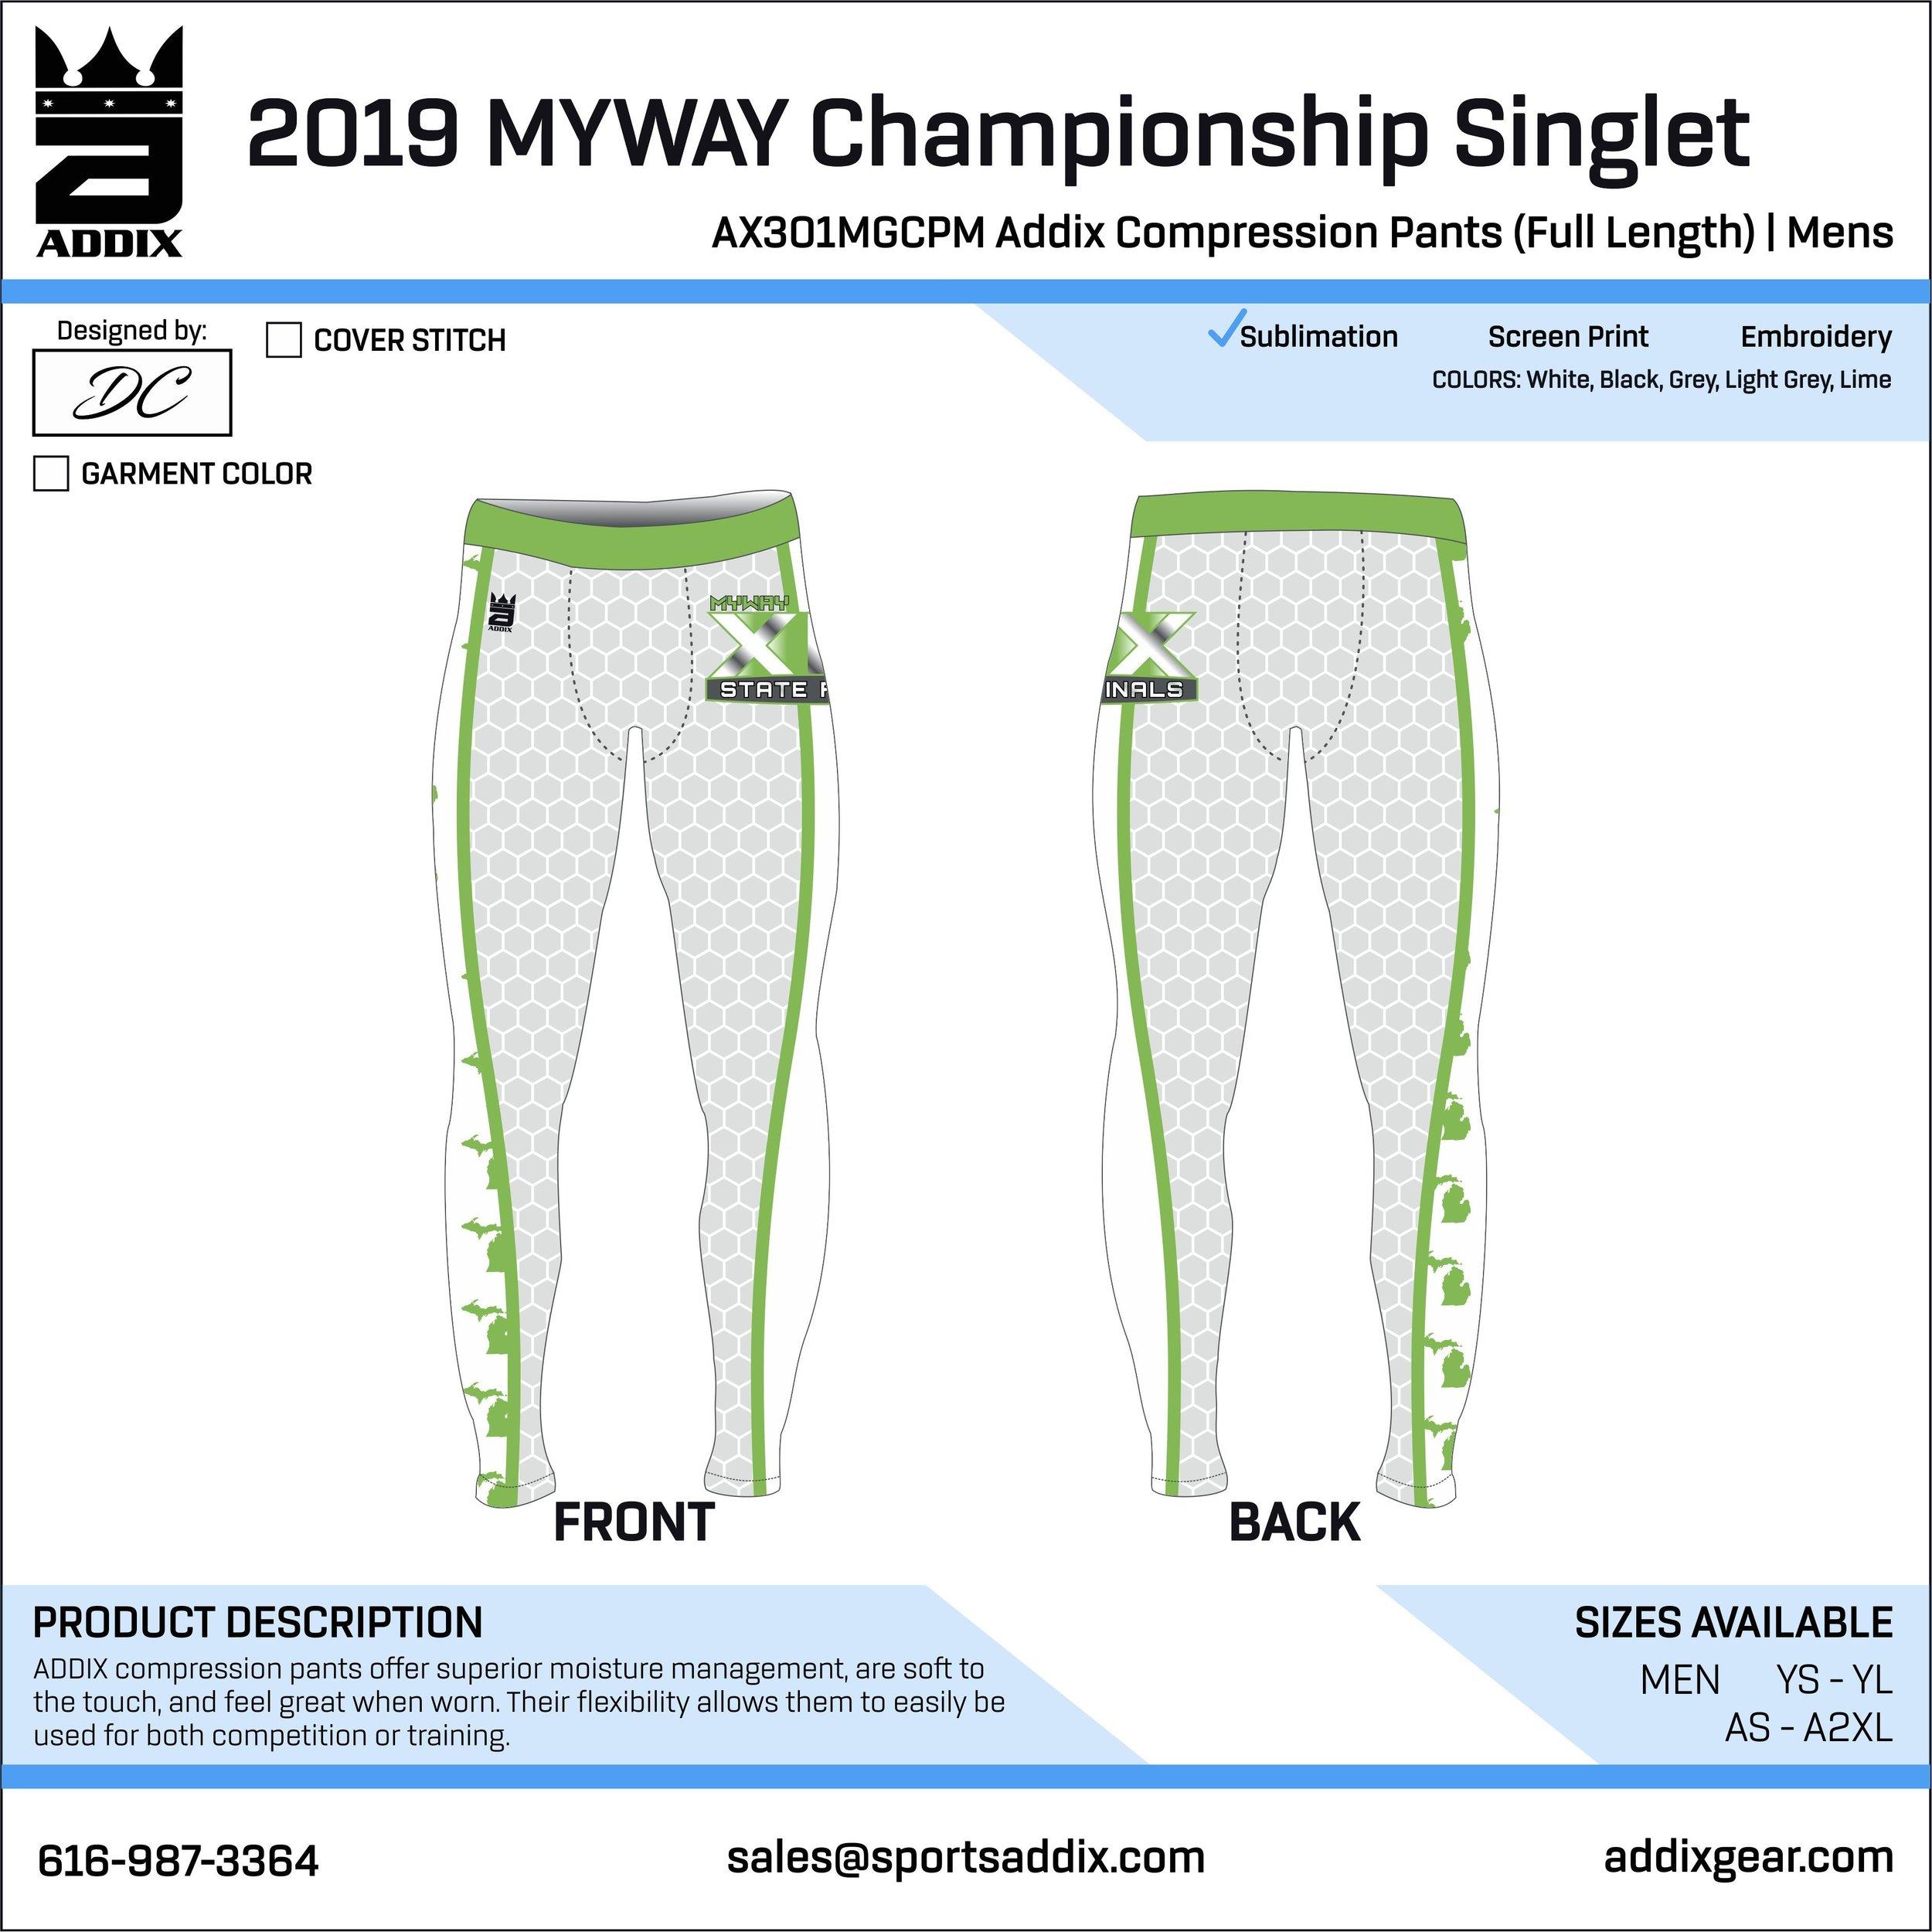 2019 MYWAY Championship Singlet_2019_2-14_DC_Comp Pants.jpg